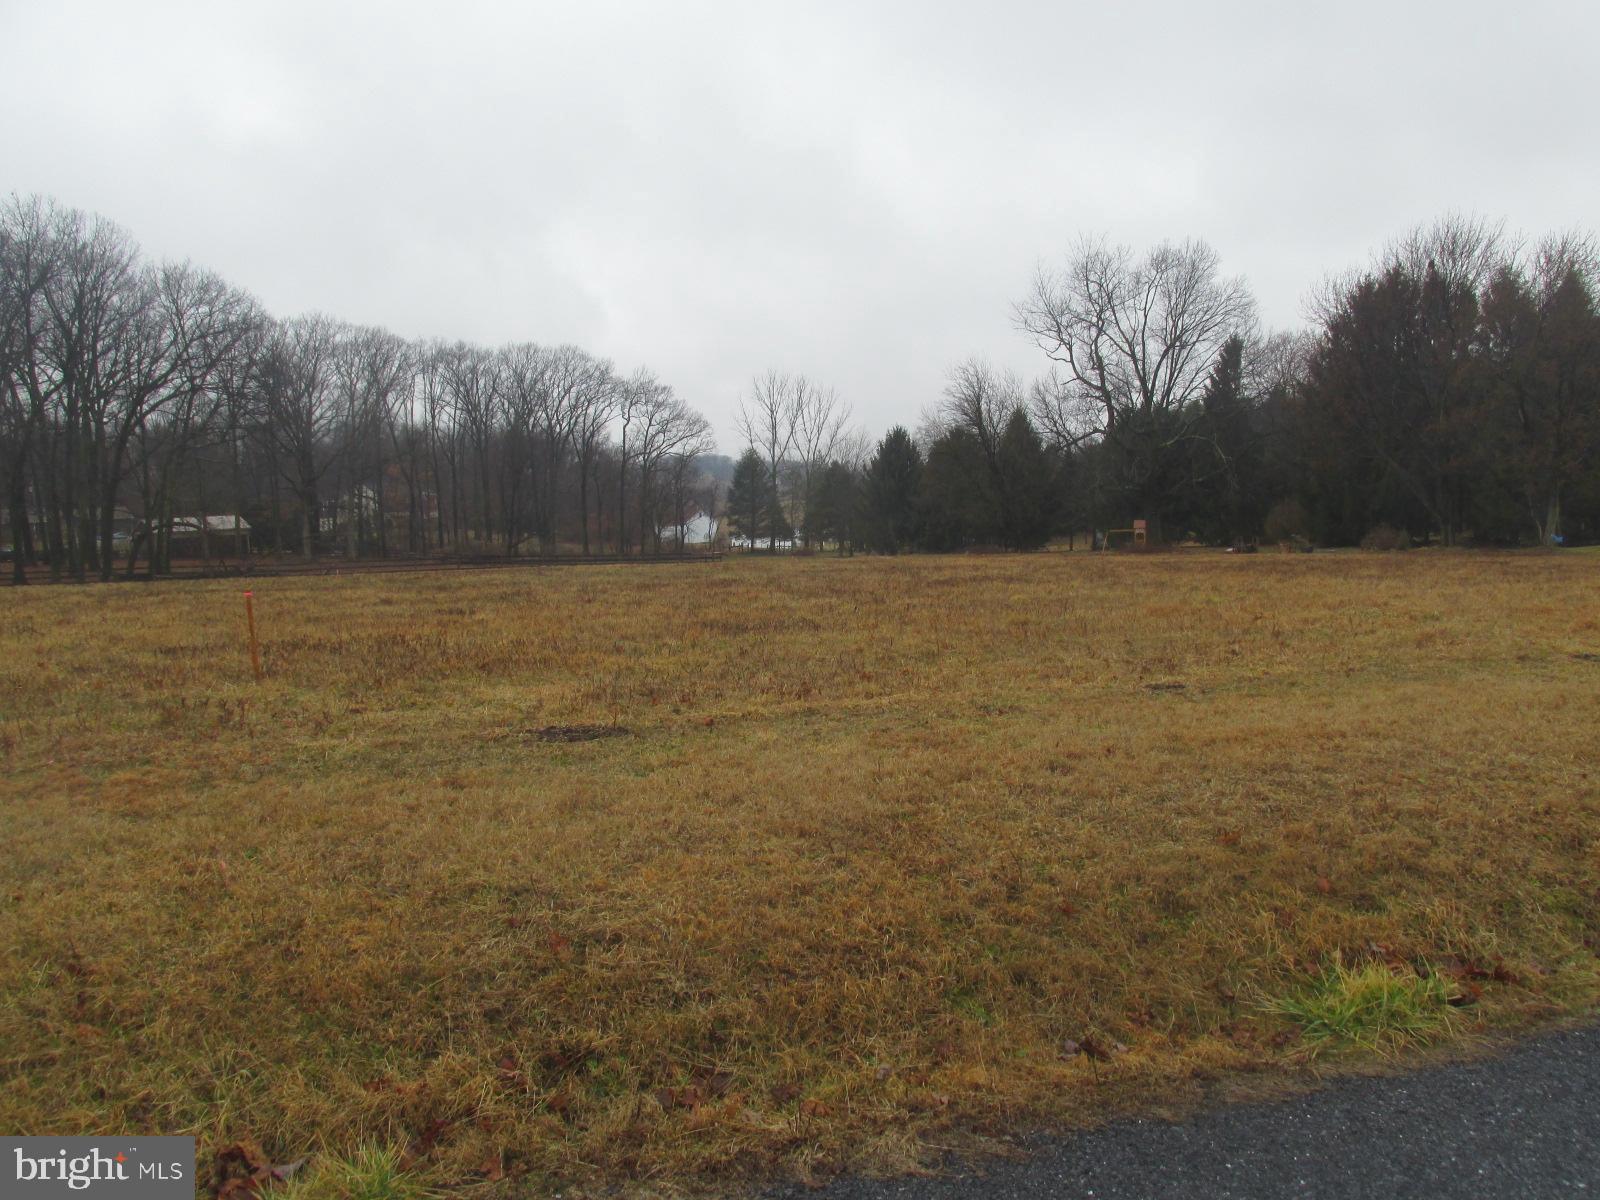 1778 Kecks Road LOT 1, Breinigsville, PA 18031